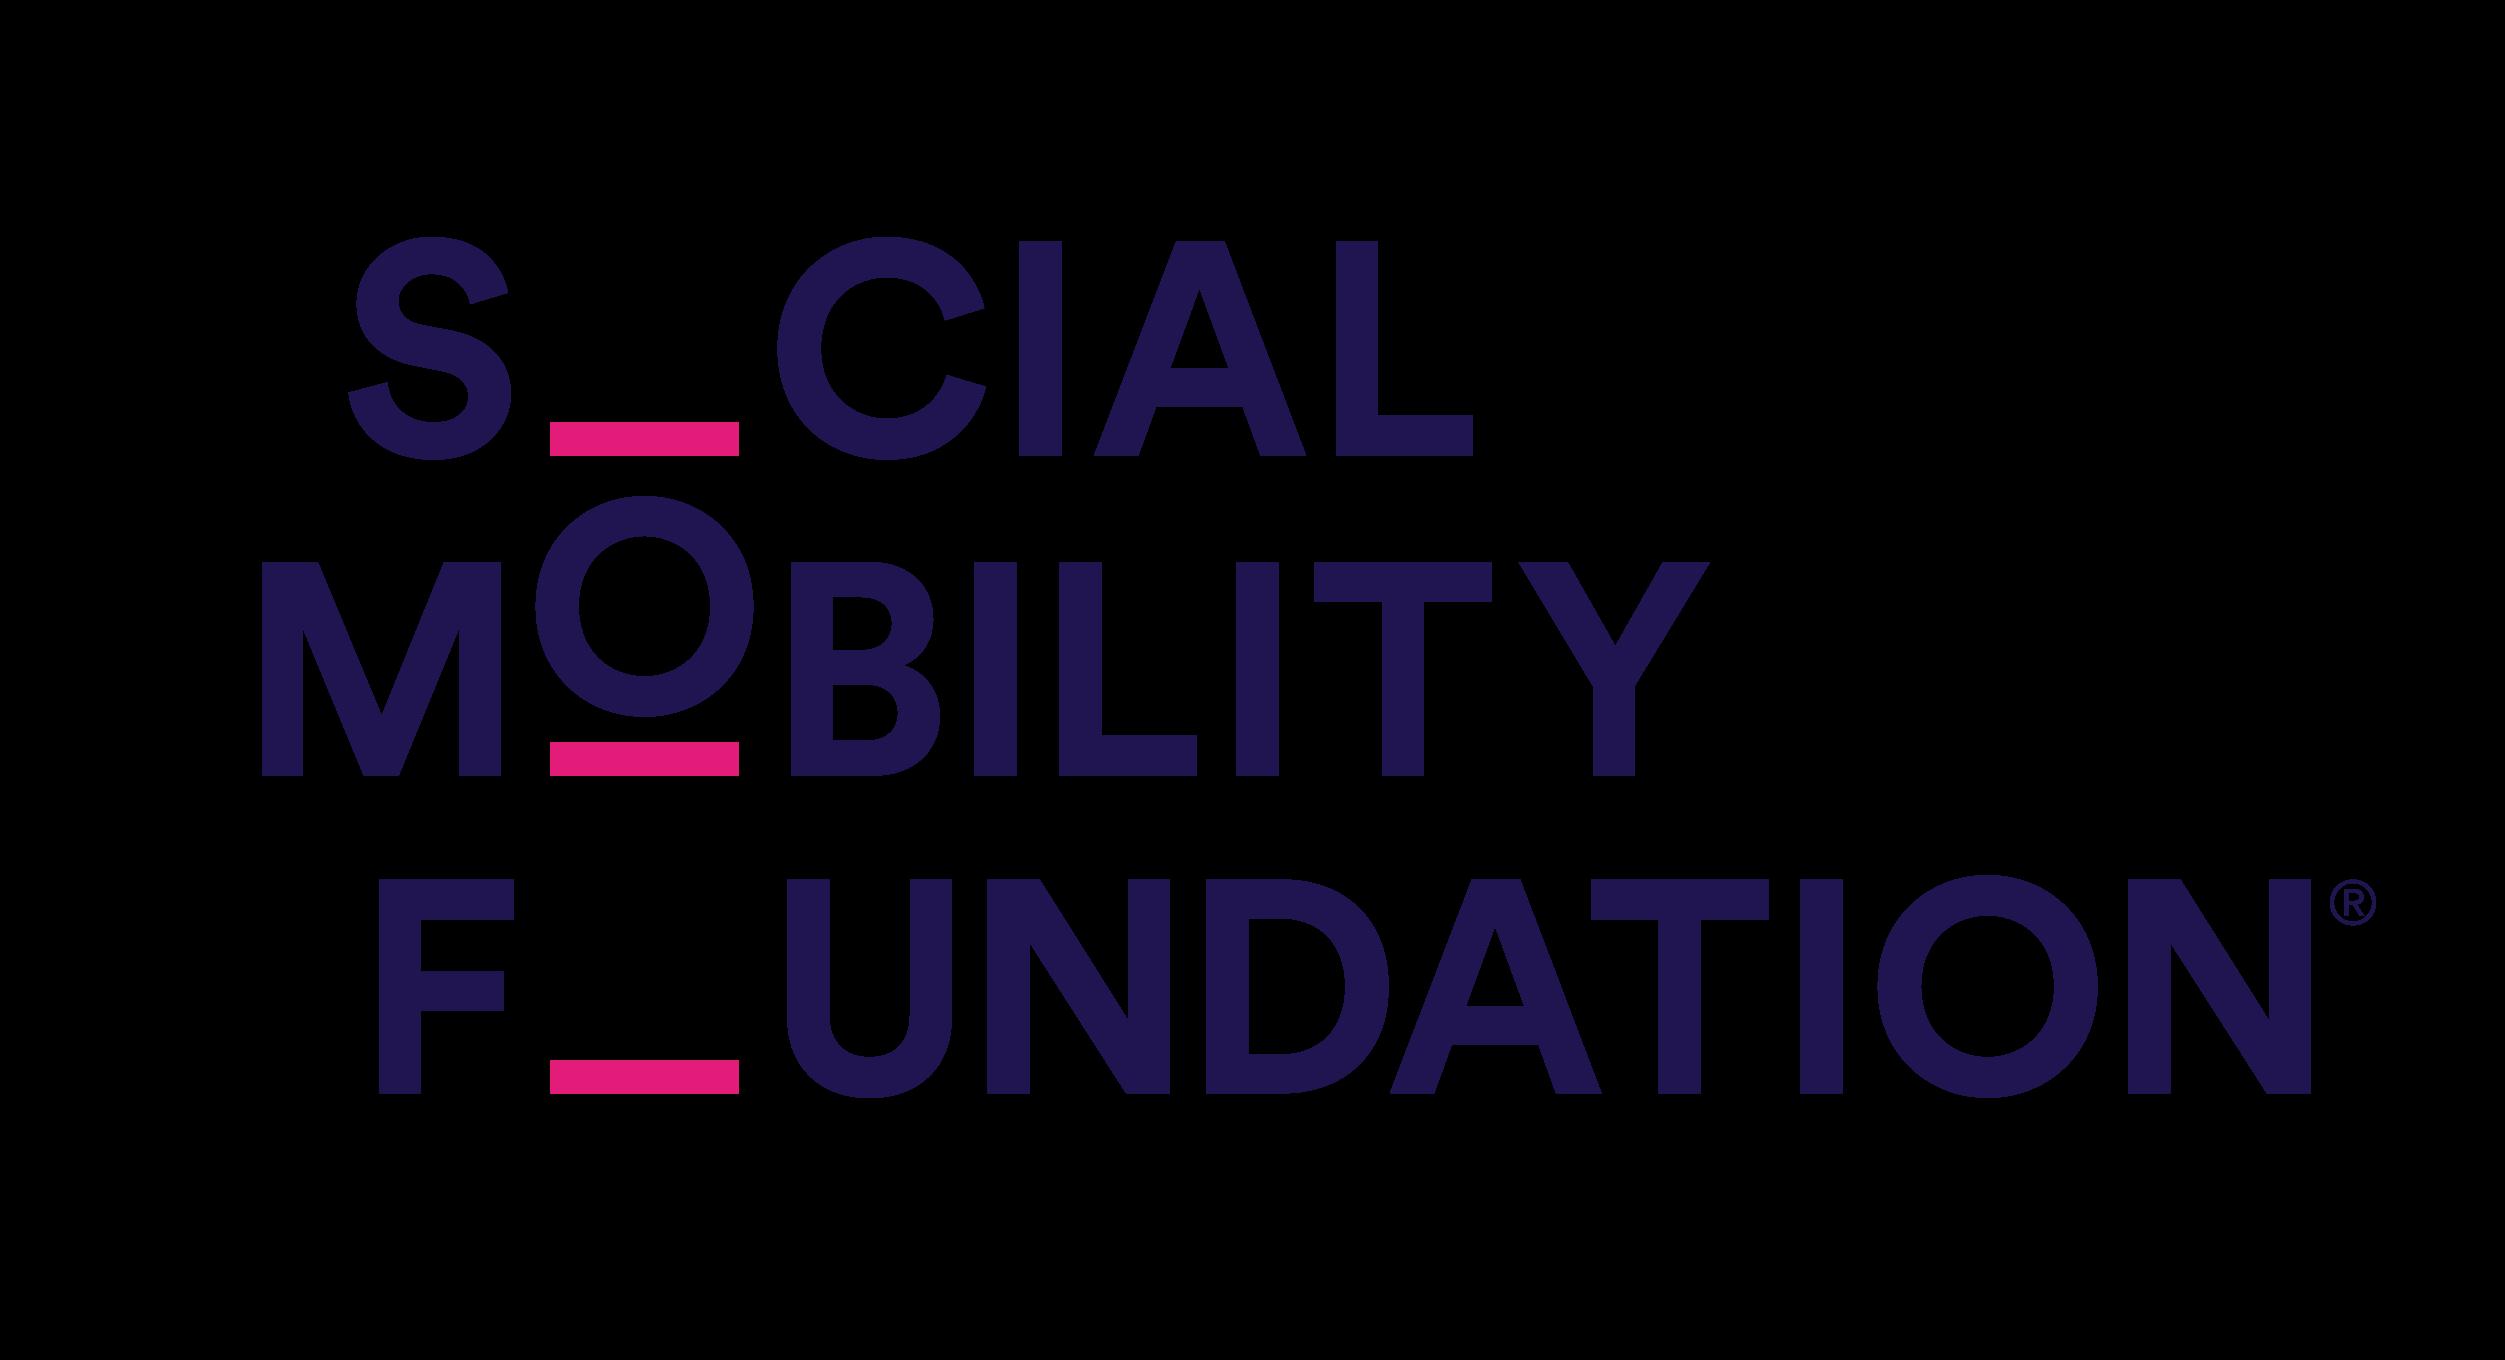 The Social Mobility Foundation (SMF)